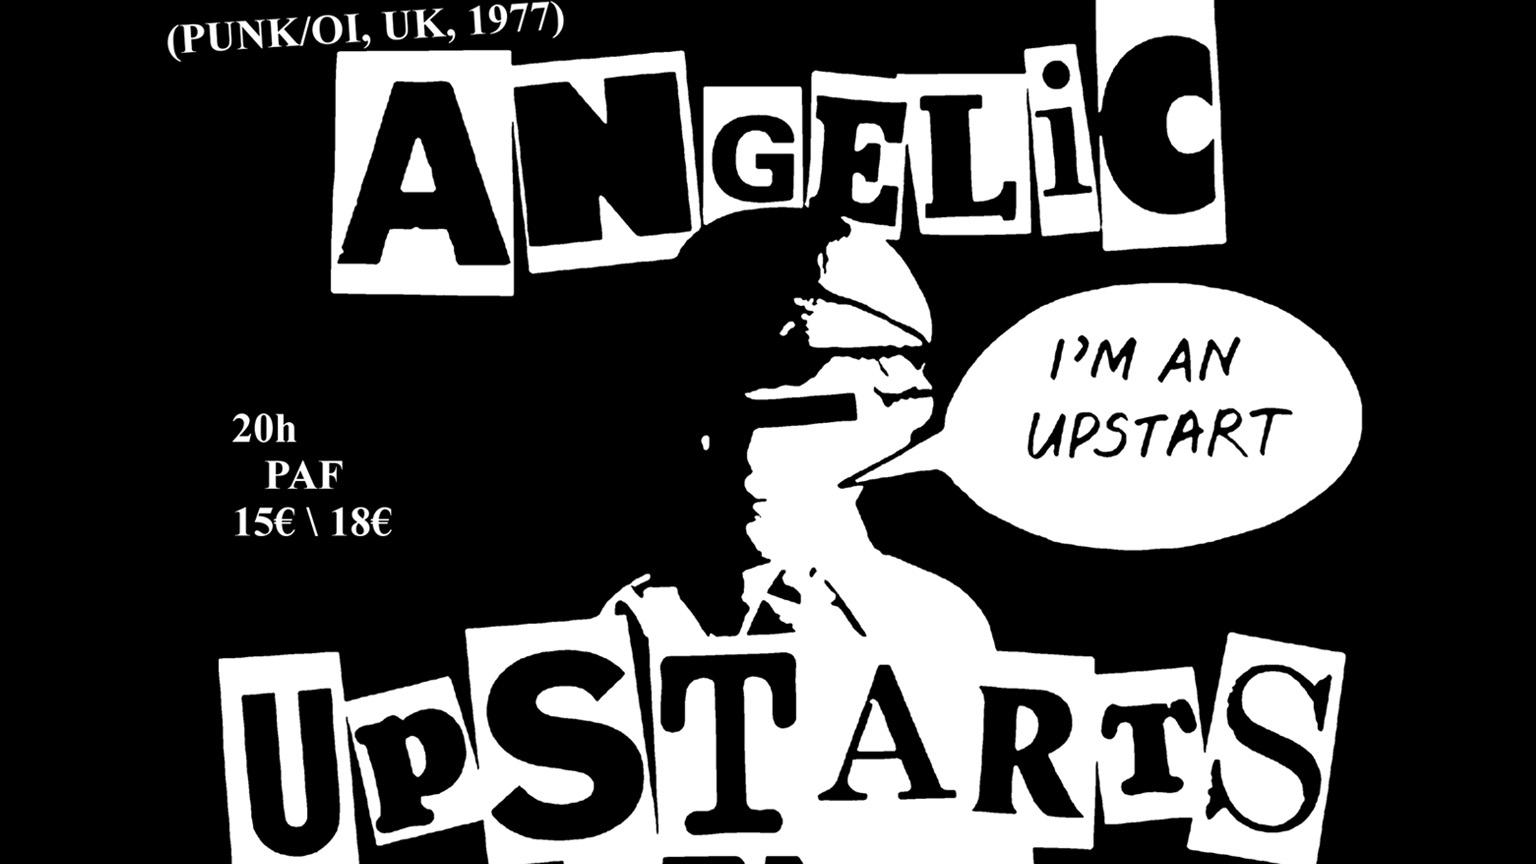 04.02.2019 – Angelic Upstarts + Wunderbach + Plomb